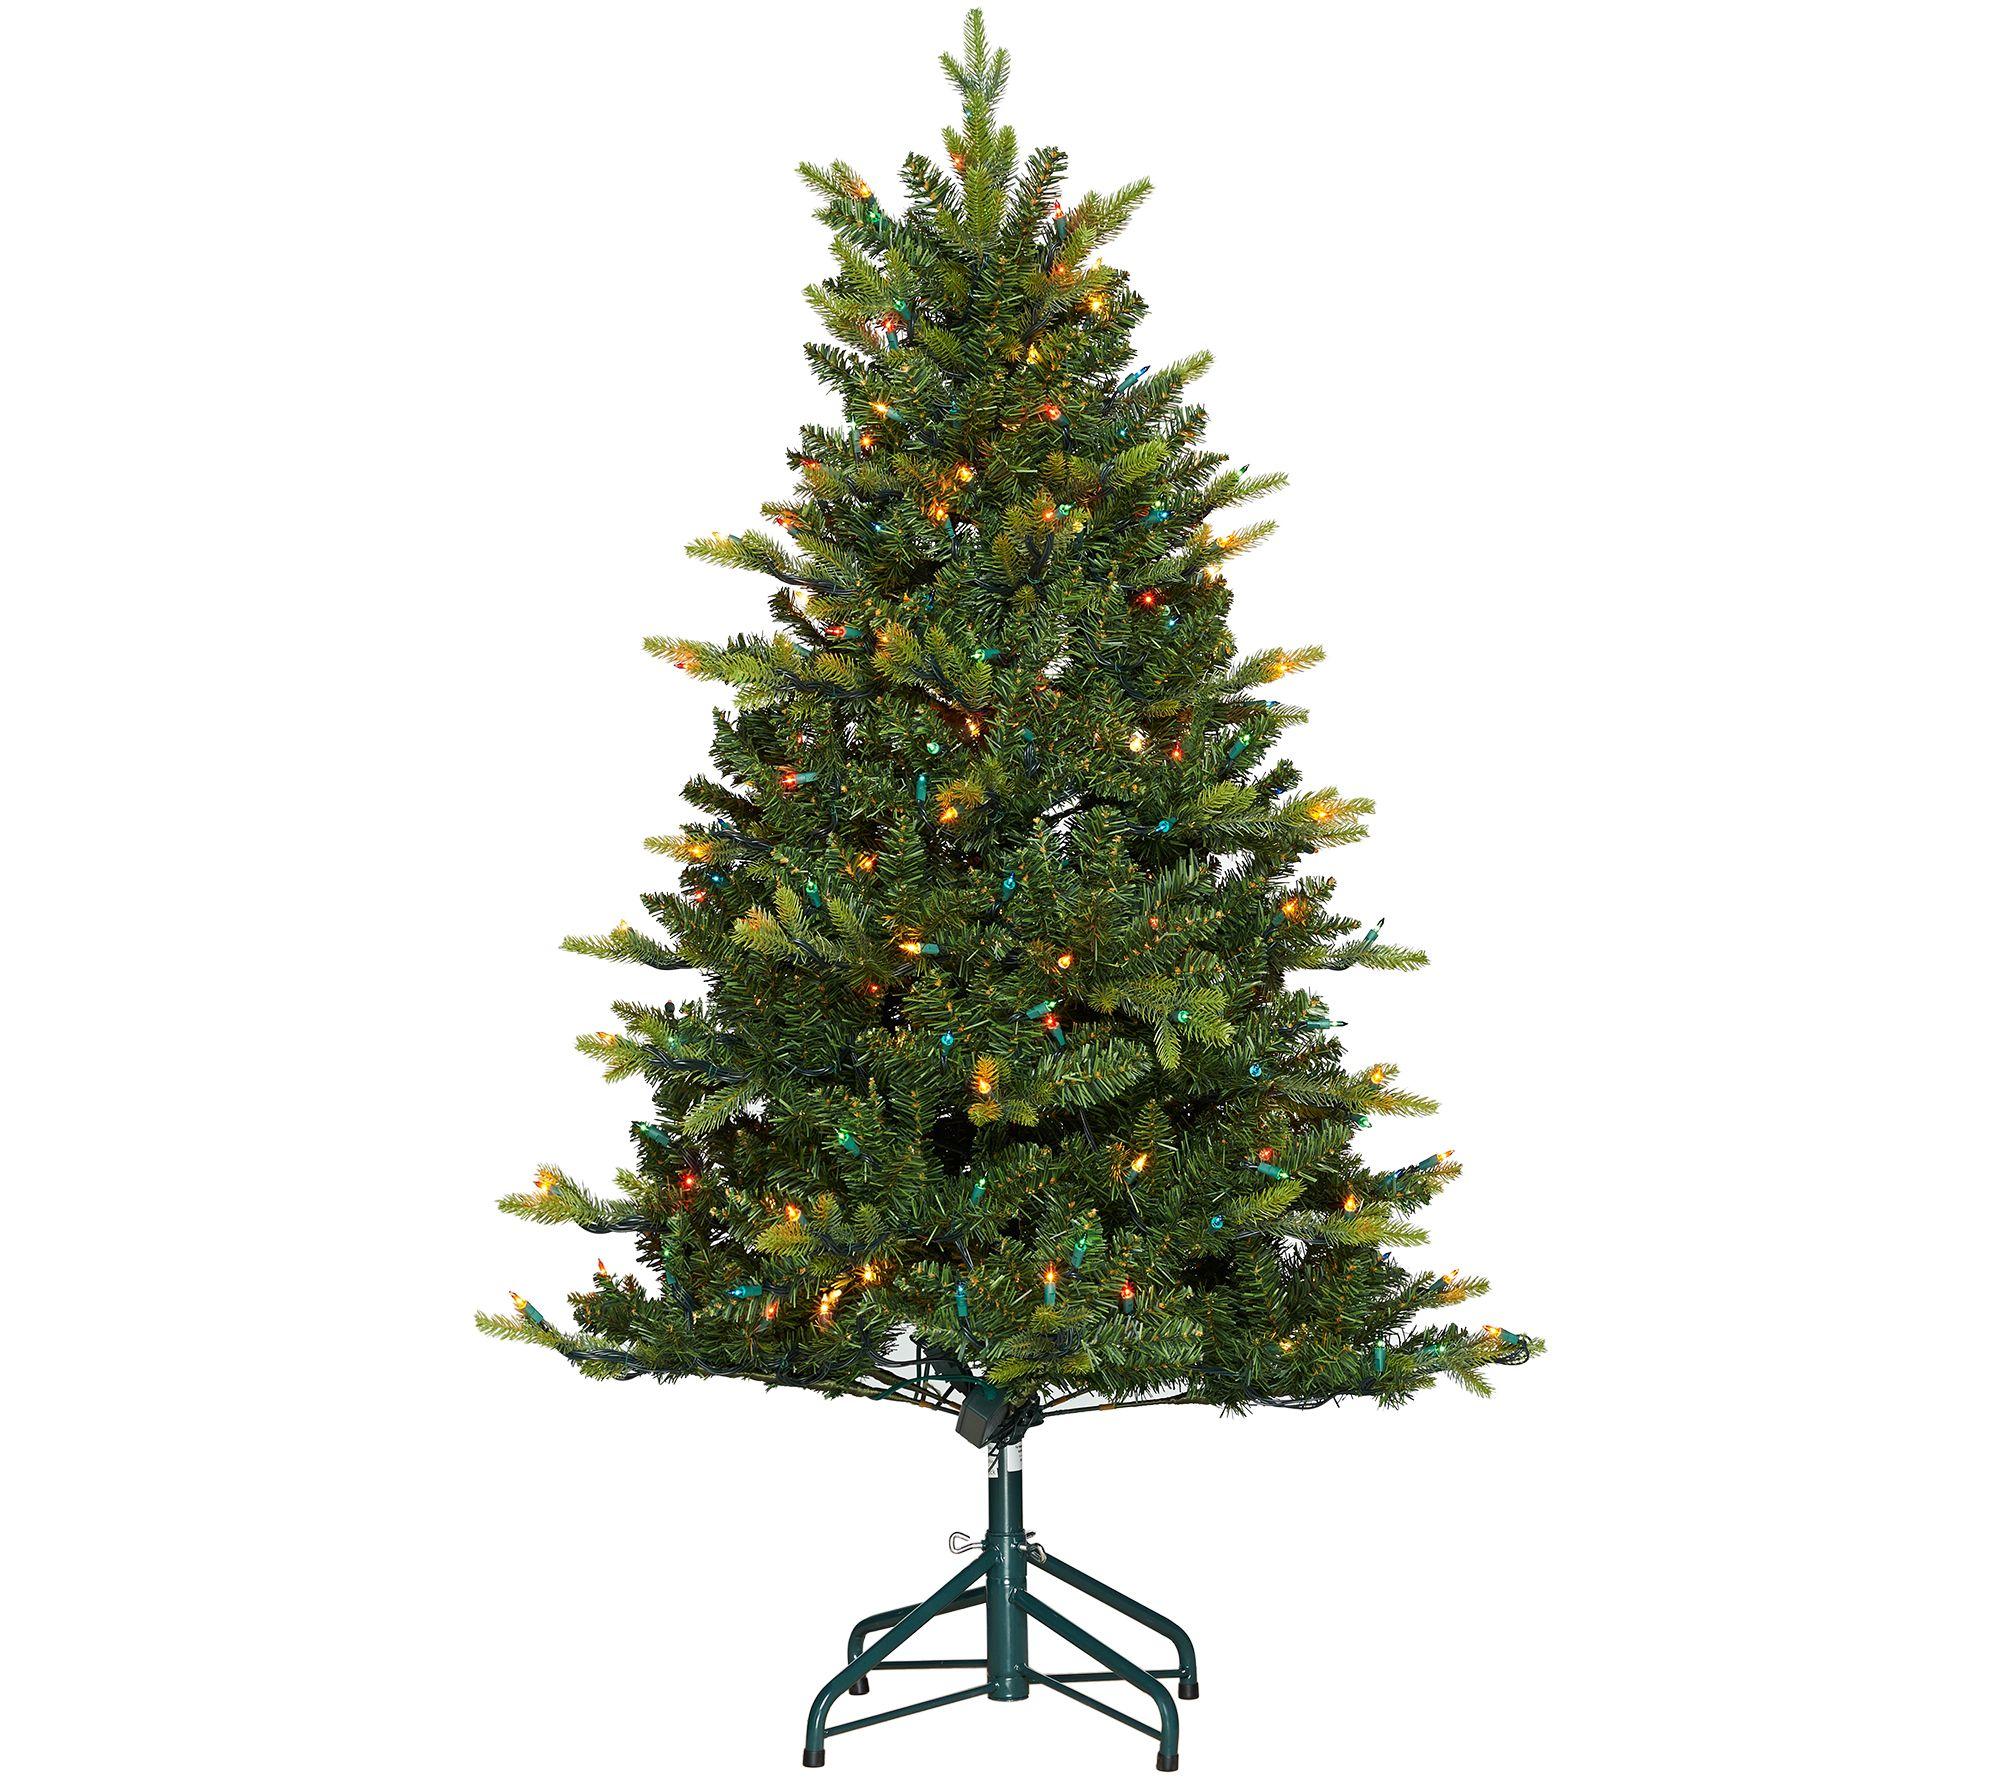 Grand Christmas Tree: Bethlehem Lights 5' Grand Fir Tree With Swift Lock